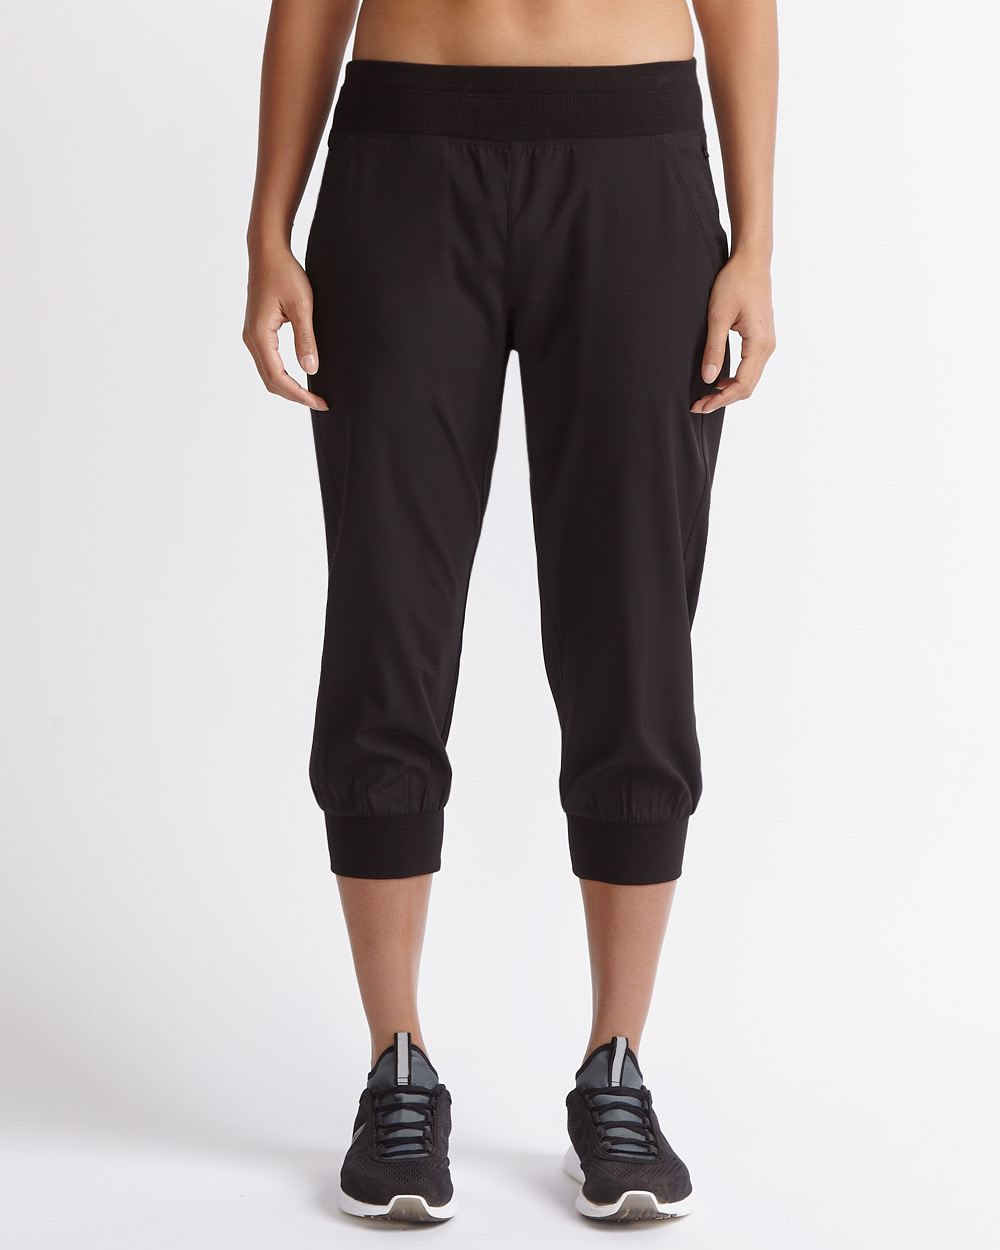 pantalon de sport capri hyba femmes reitmans. Black Bedroom Furniture Sets. Home Design Ideas